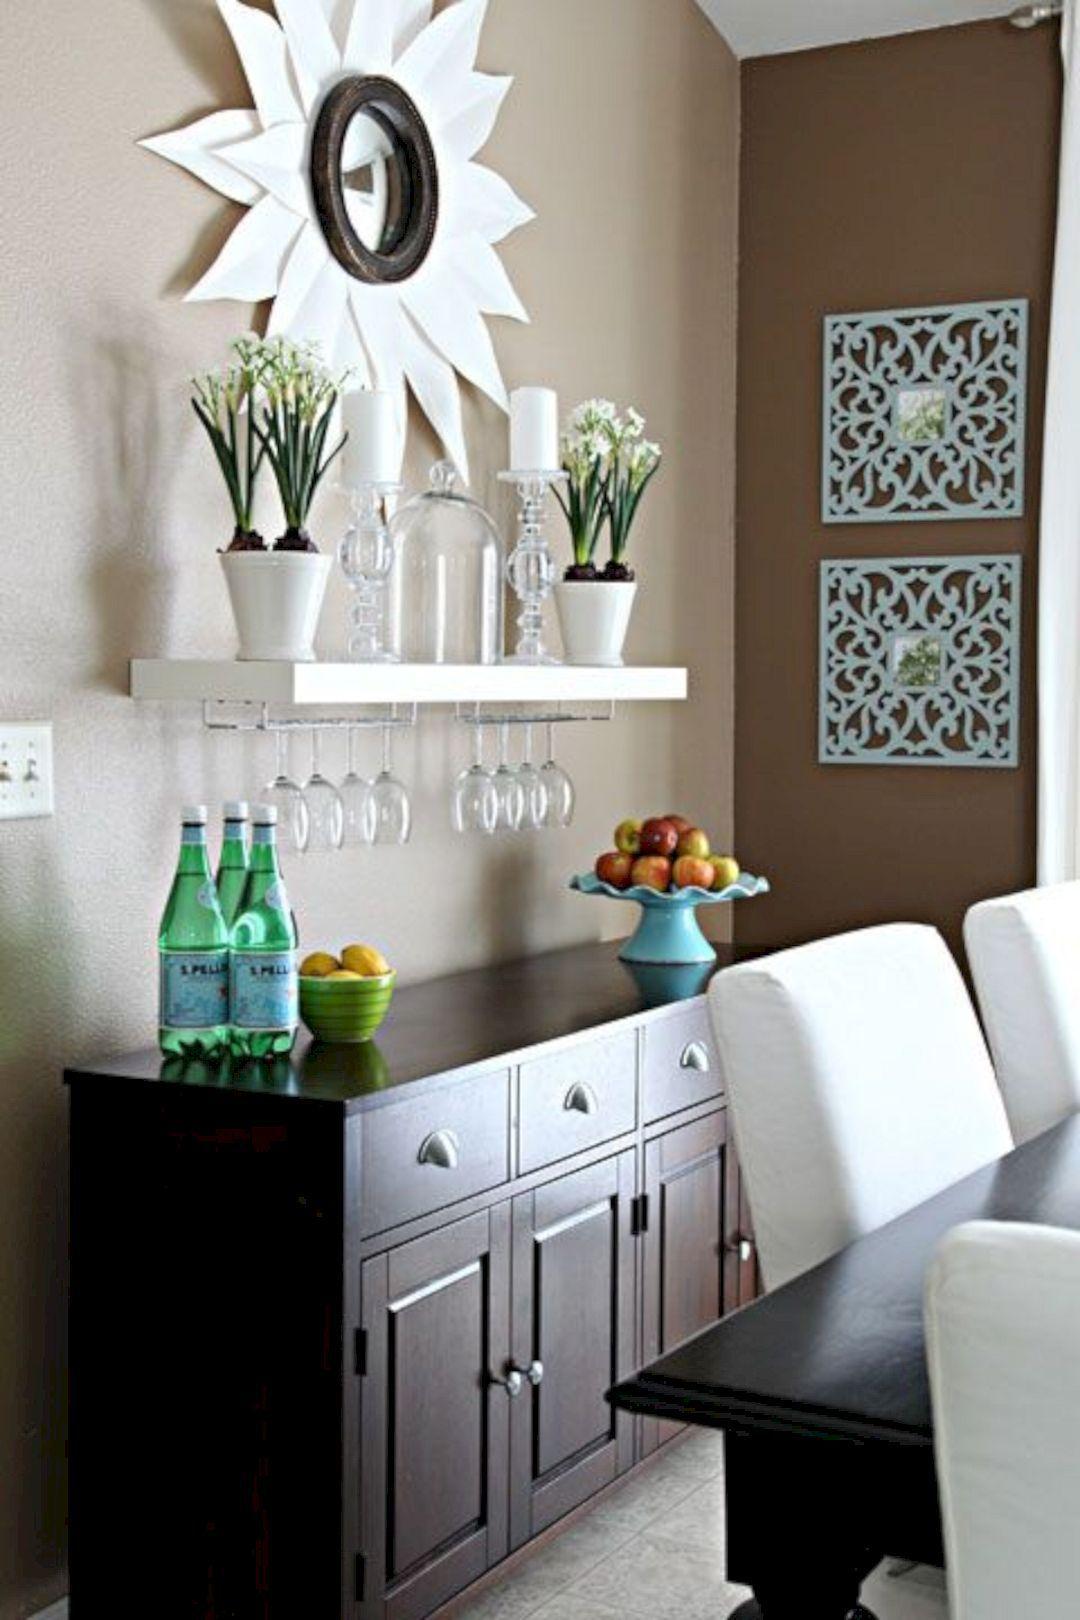 5 Best Dining Room Decorating Ideas Dining Room Buffet Dining Room Bar Dining Room Walls